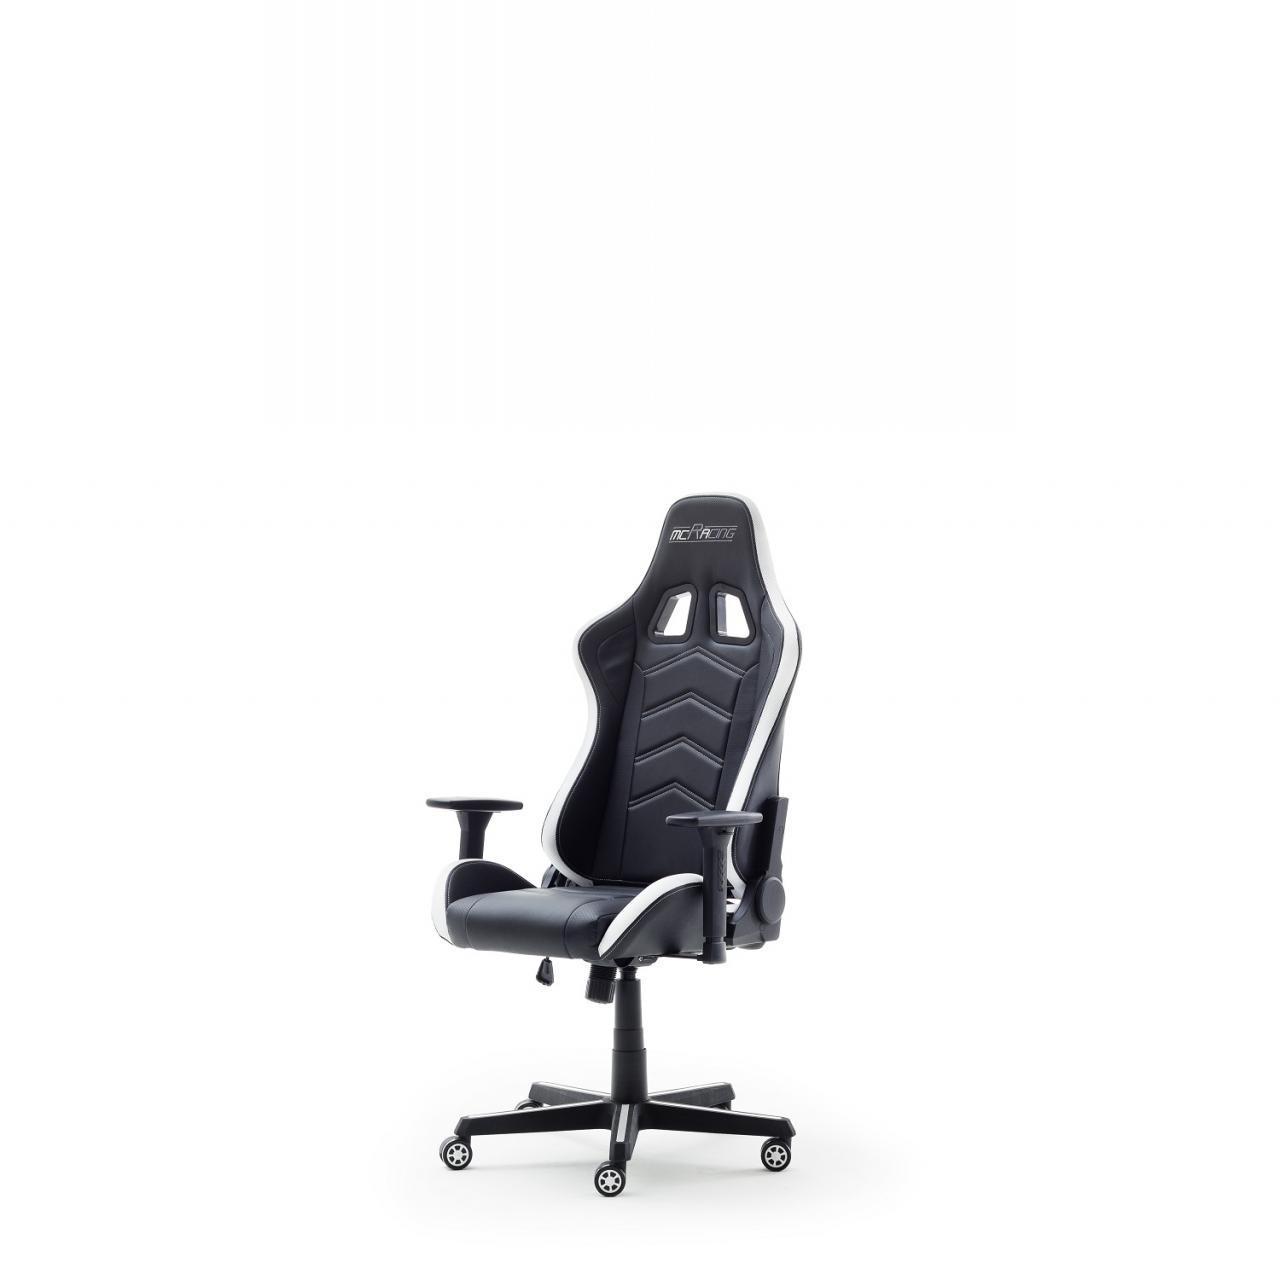 Schreibtischstuhl mcRacing LED Gamingstuhl Bürostuhl mit LED weiß-schwarz